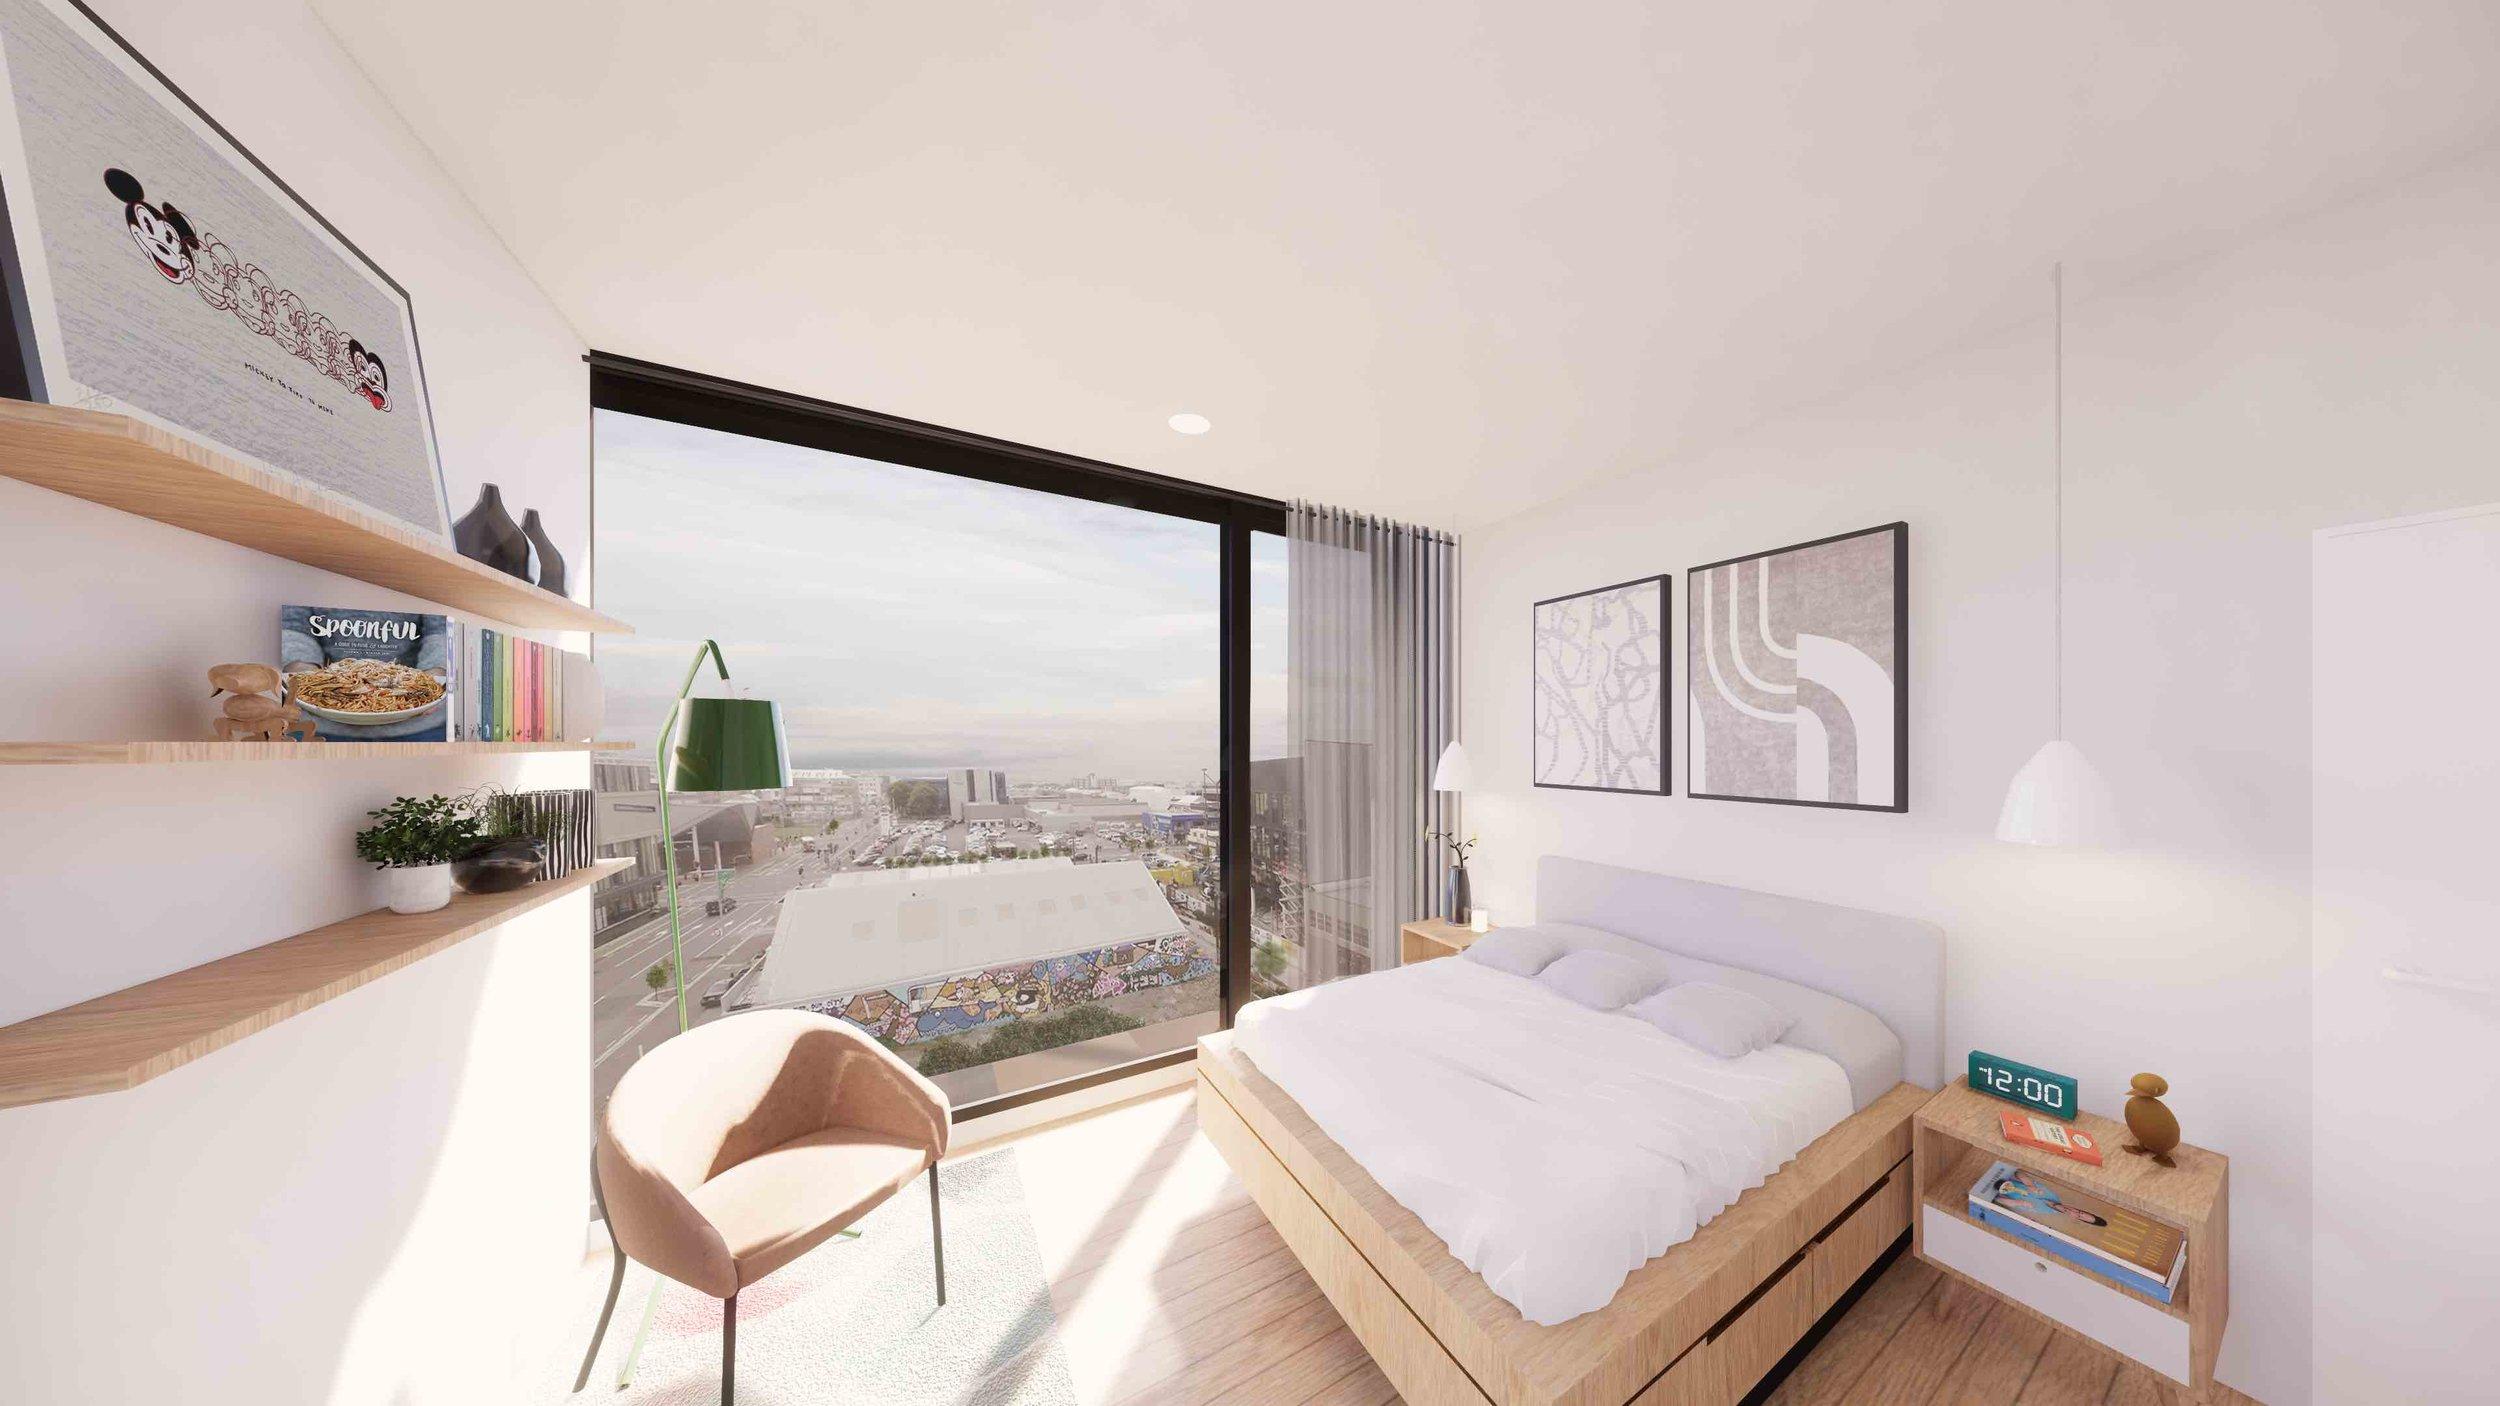 H713_Tuam Street - Laneway - Bedroom.jpg